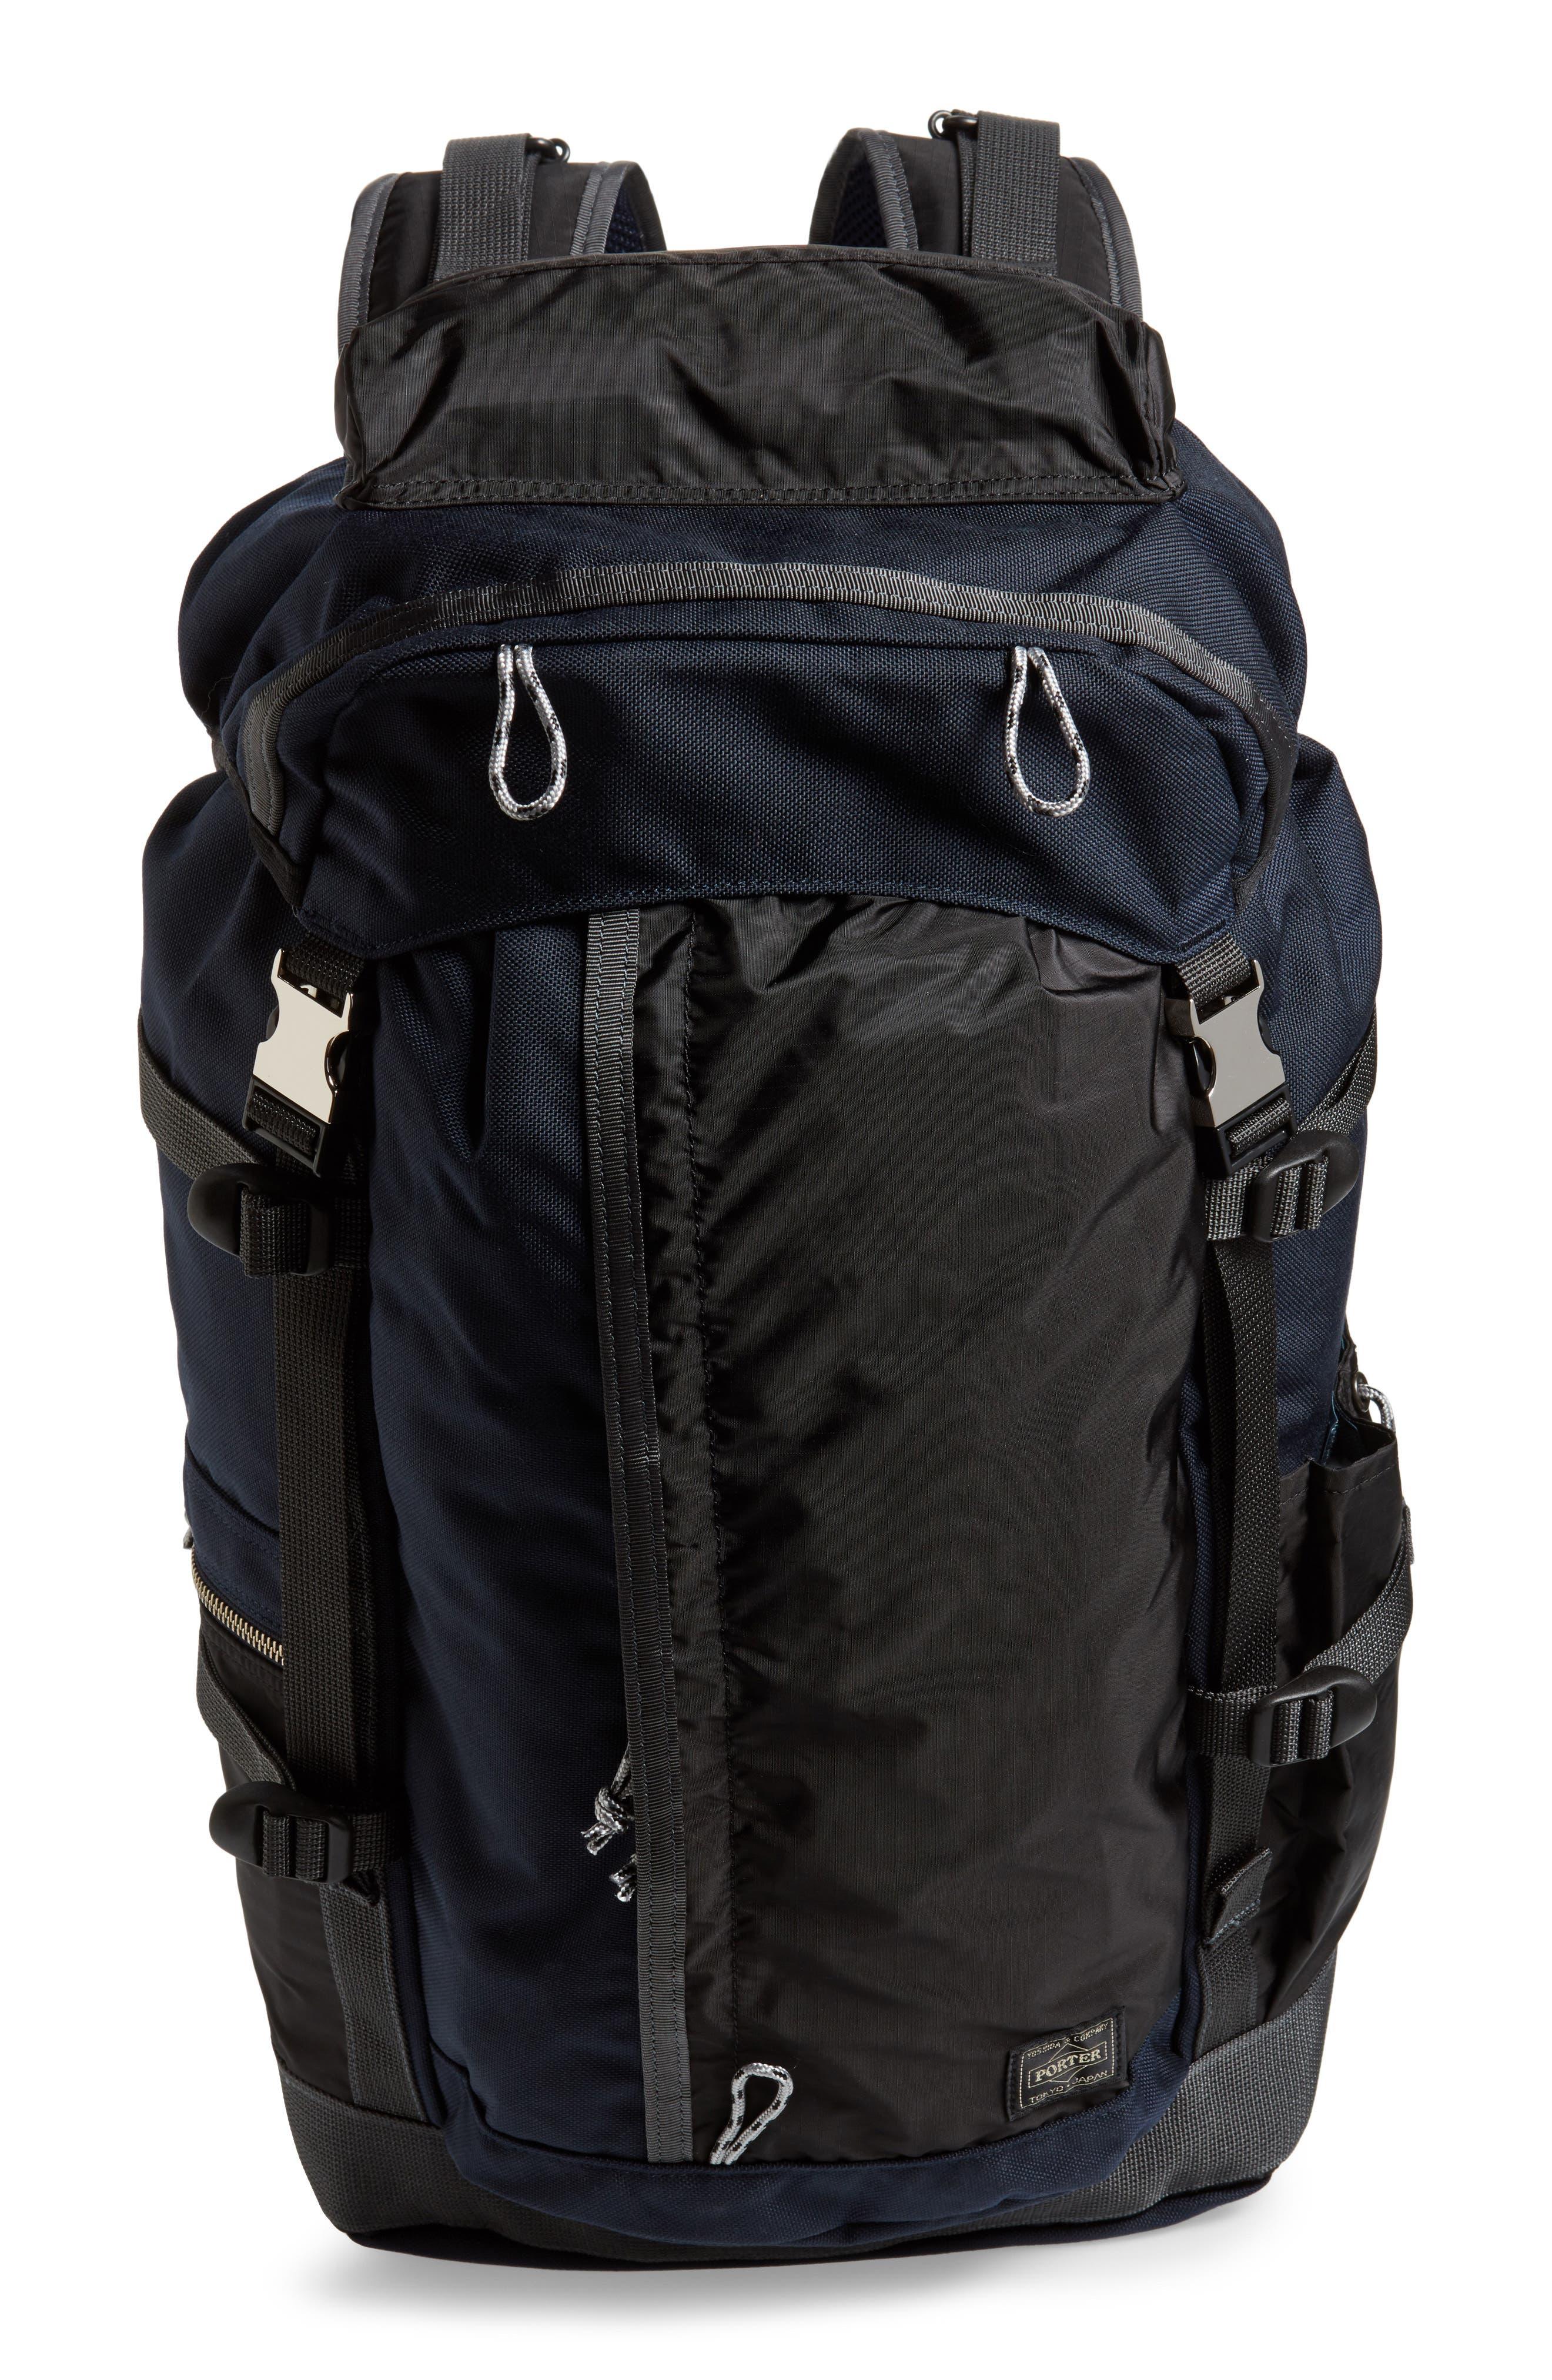 Porter-Yoshida & Co. Hype Backpack,                         Main,                         color, Navy/ Black